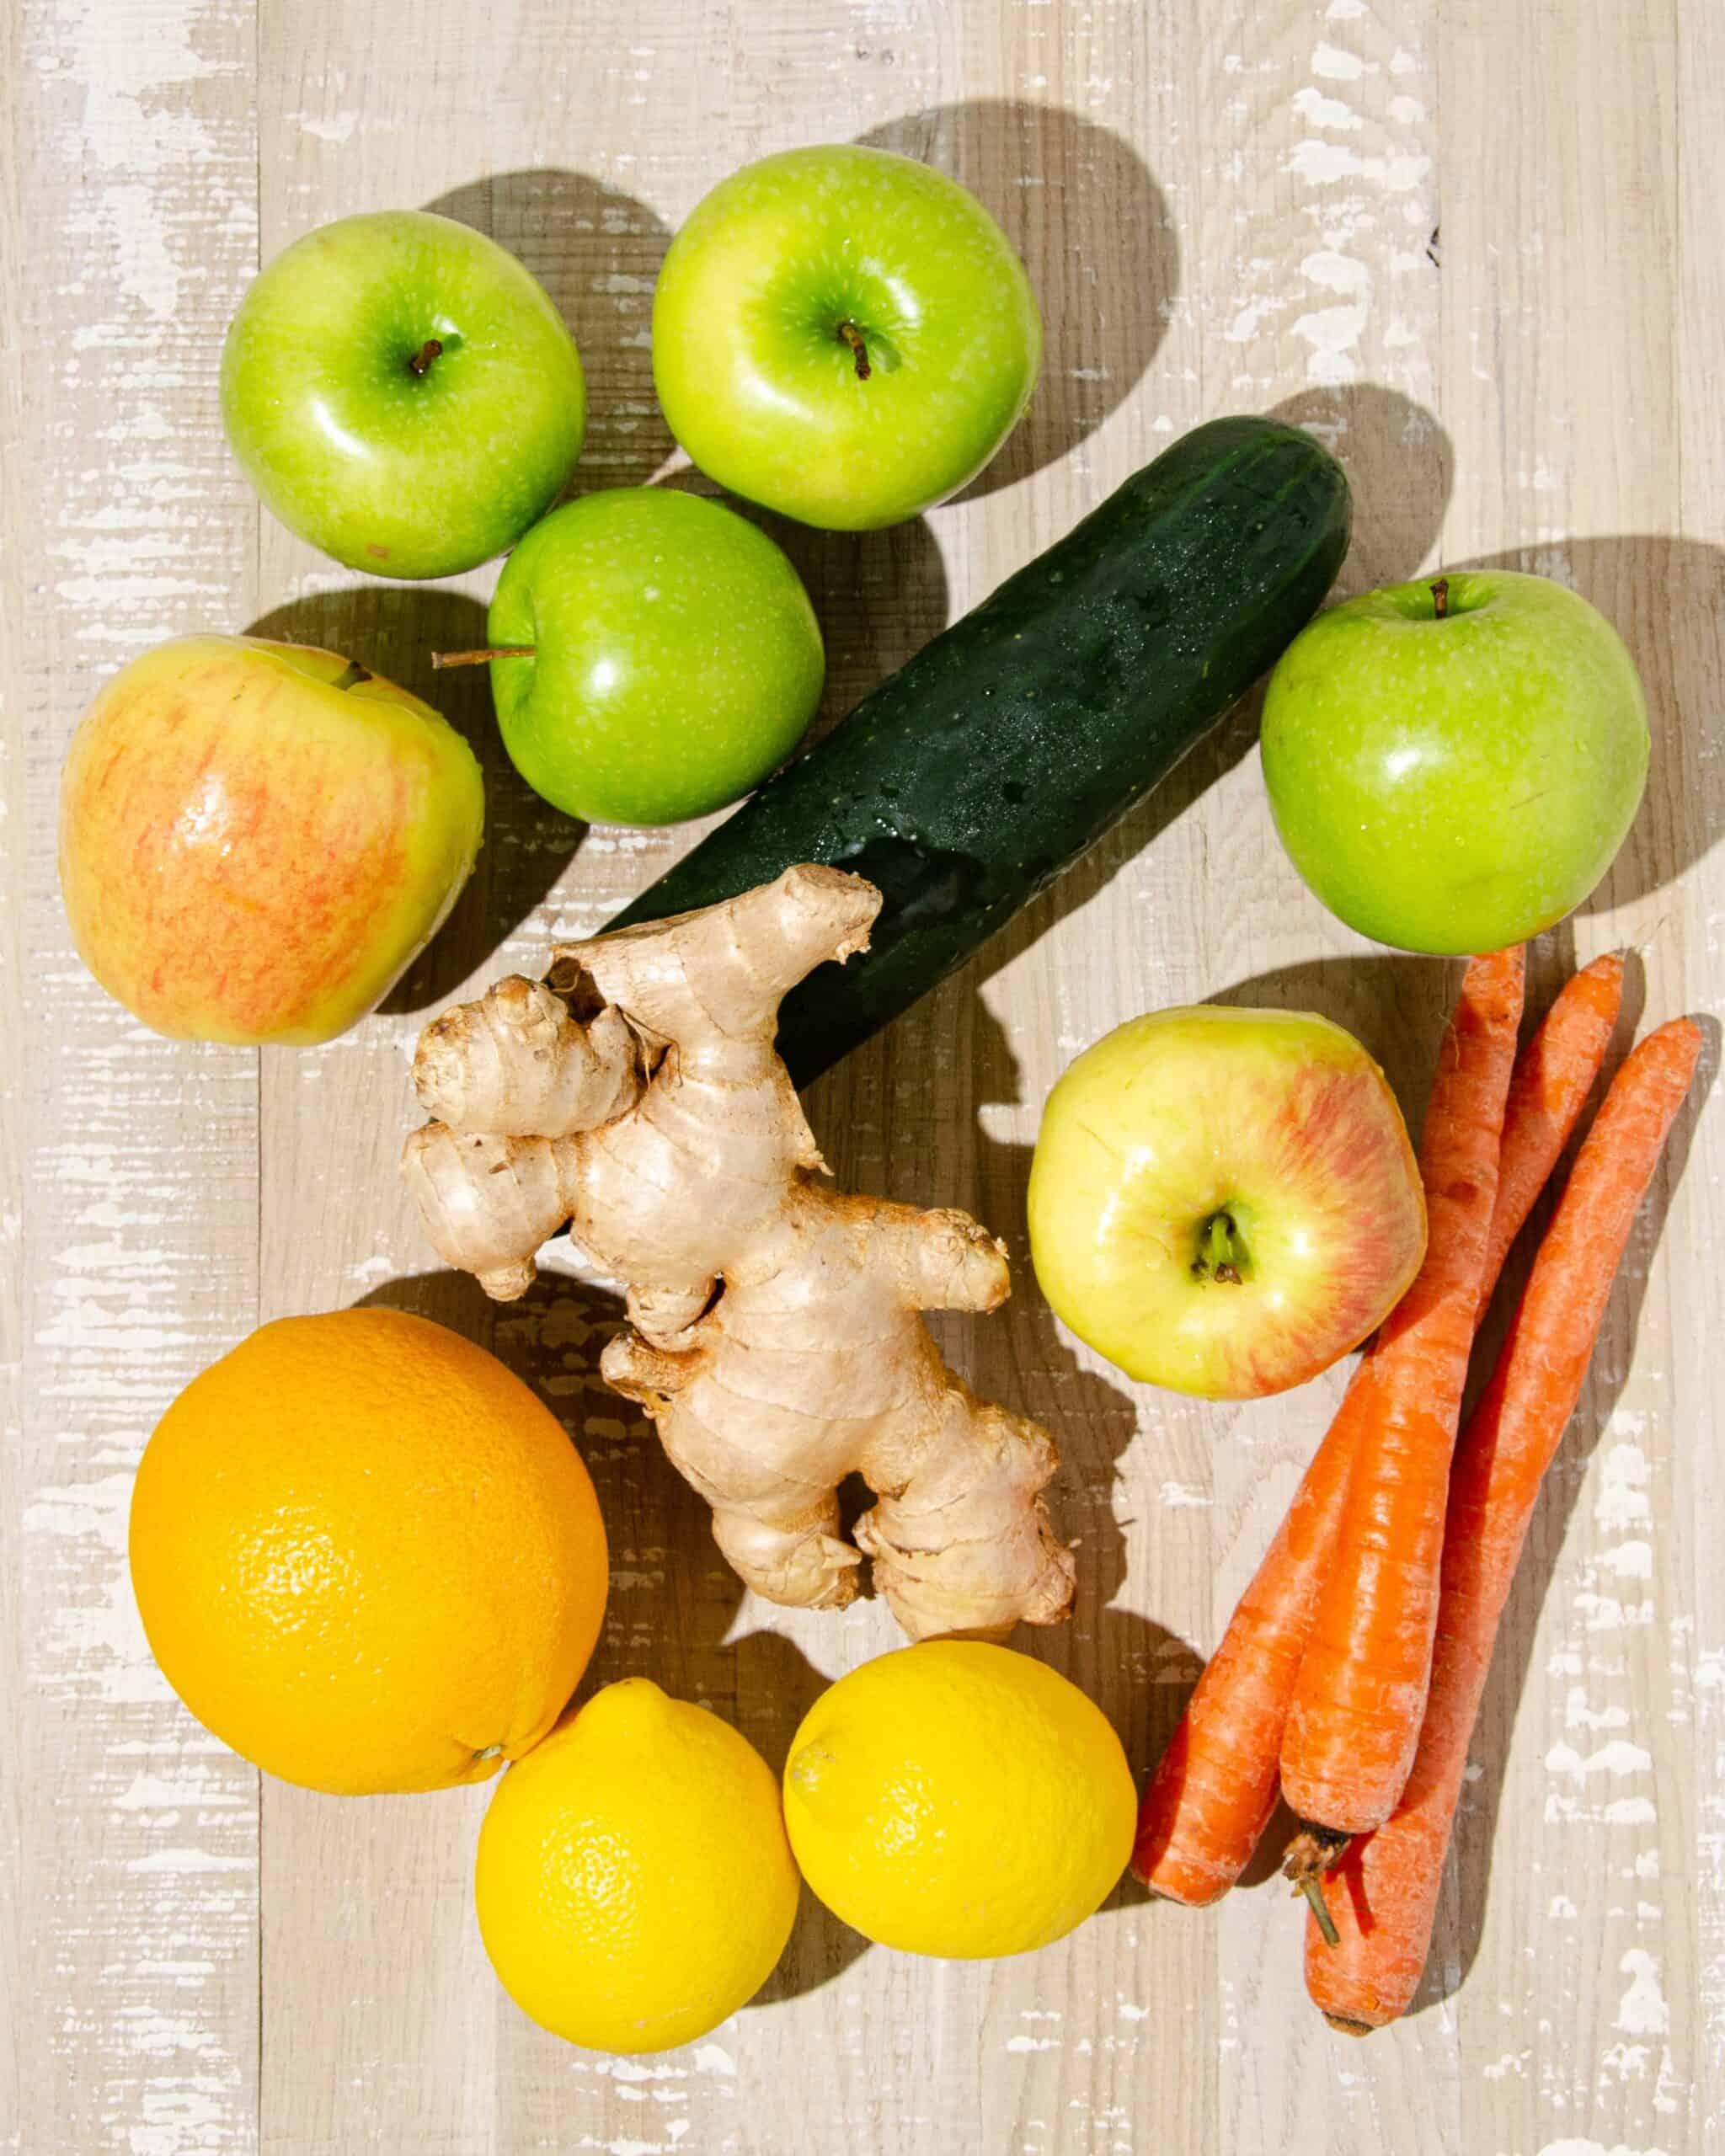 ingredients for juicer recipes for energy, including green apples, cucumber, ginger, carrots, apples, oranges and lemons.